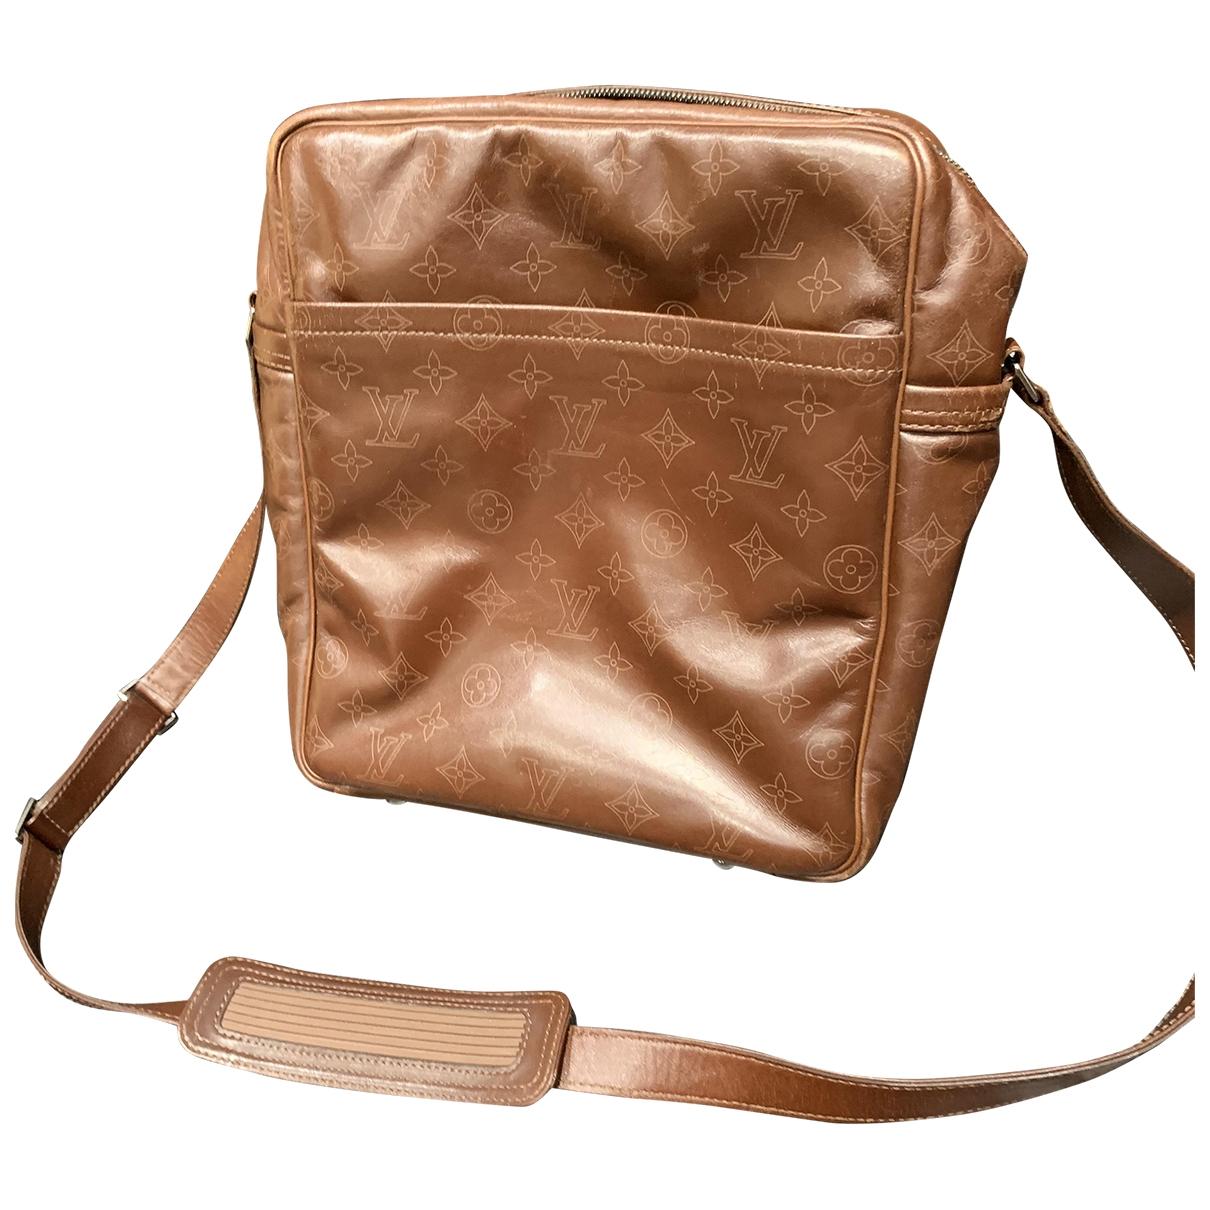 Louis Vuitton \N Brown Leather bag for Men \N